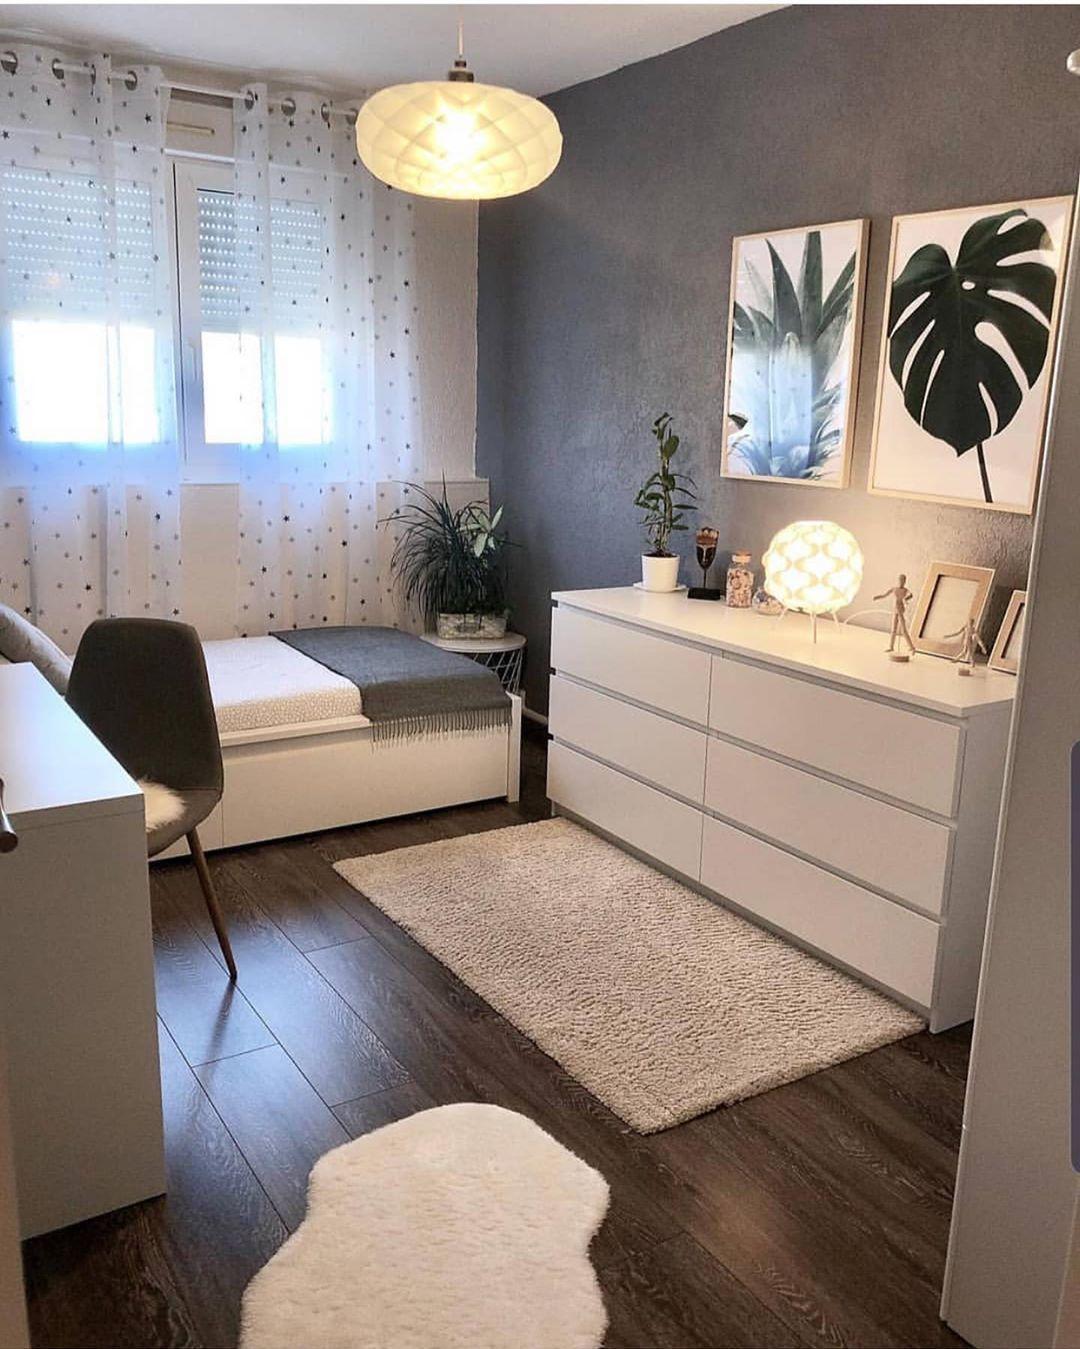 #projectcavendish #livingroom #familyroom #decor #interiors #interiorinspo #designideas #interiordecorating #interiorstyle #fireplace #tvroom#furniture #room #classyinteriors #homedecor #interior123 #bedroom #home #house #housedecor #hallwaydecor #homedesign #housedecorating#livingroomdecor #livingroom #homedesign #diningr#ootd #strong #menswear #business #uae #detail #businesswoman #fashionpost #livingroom #wheels